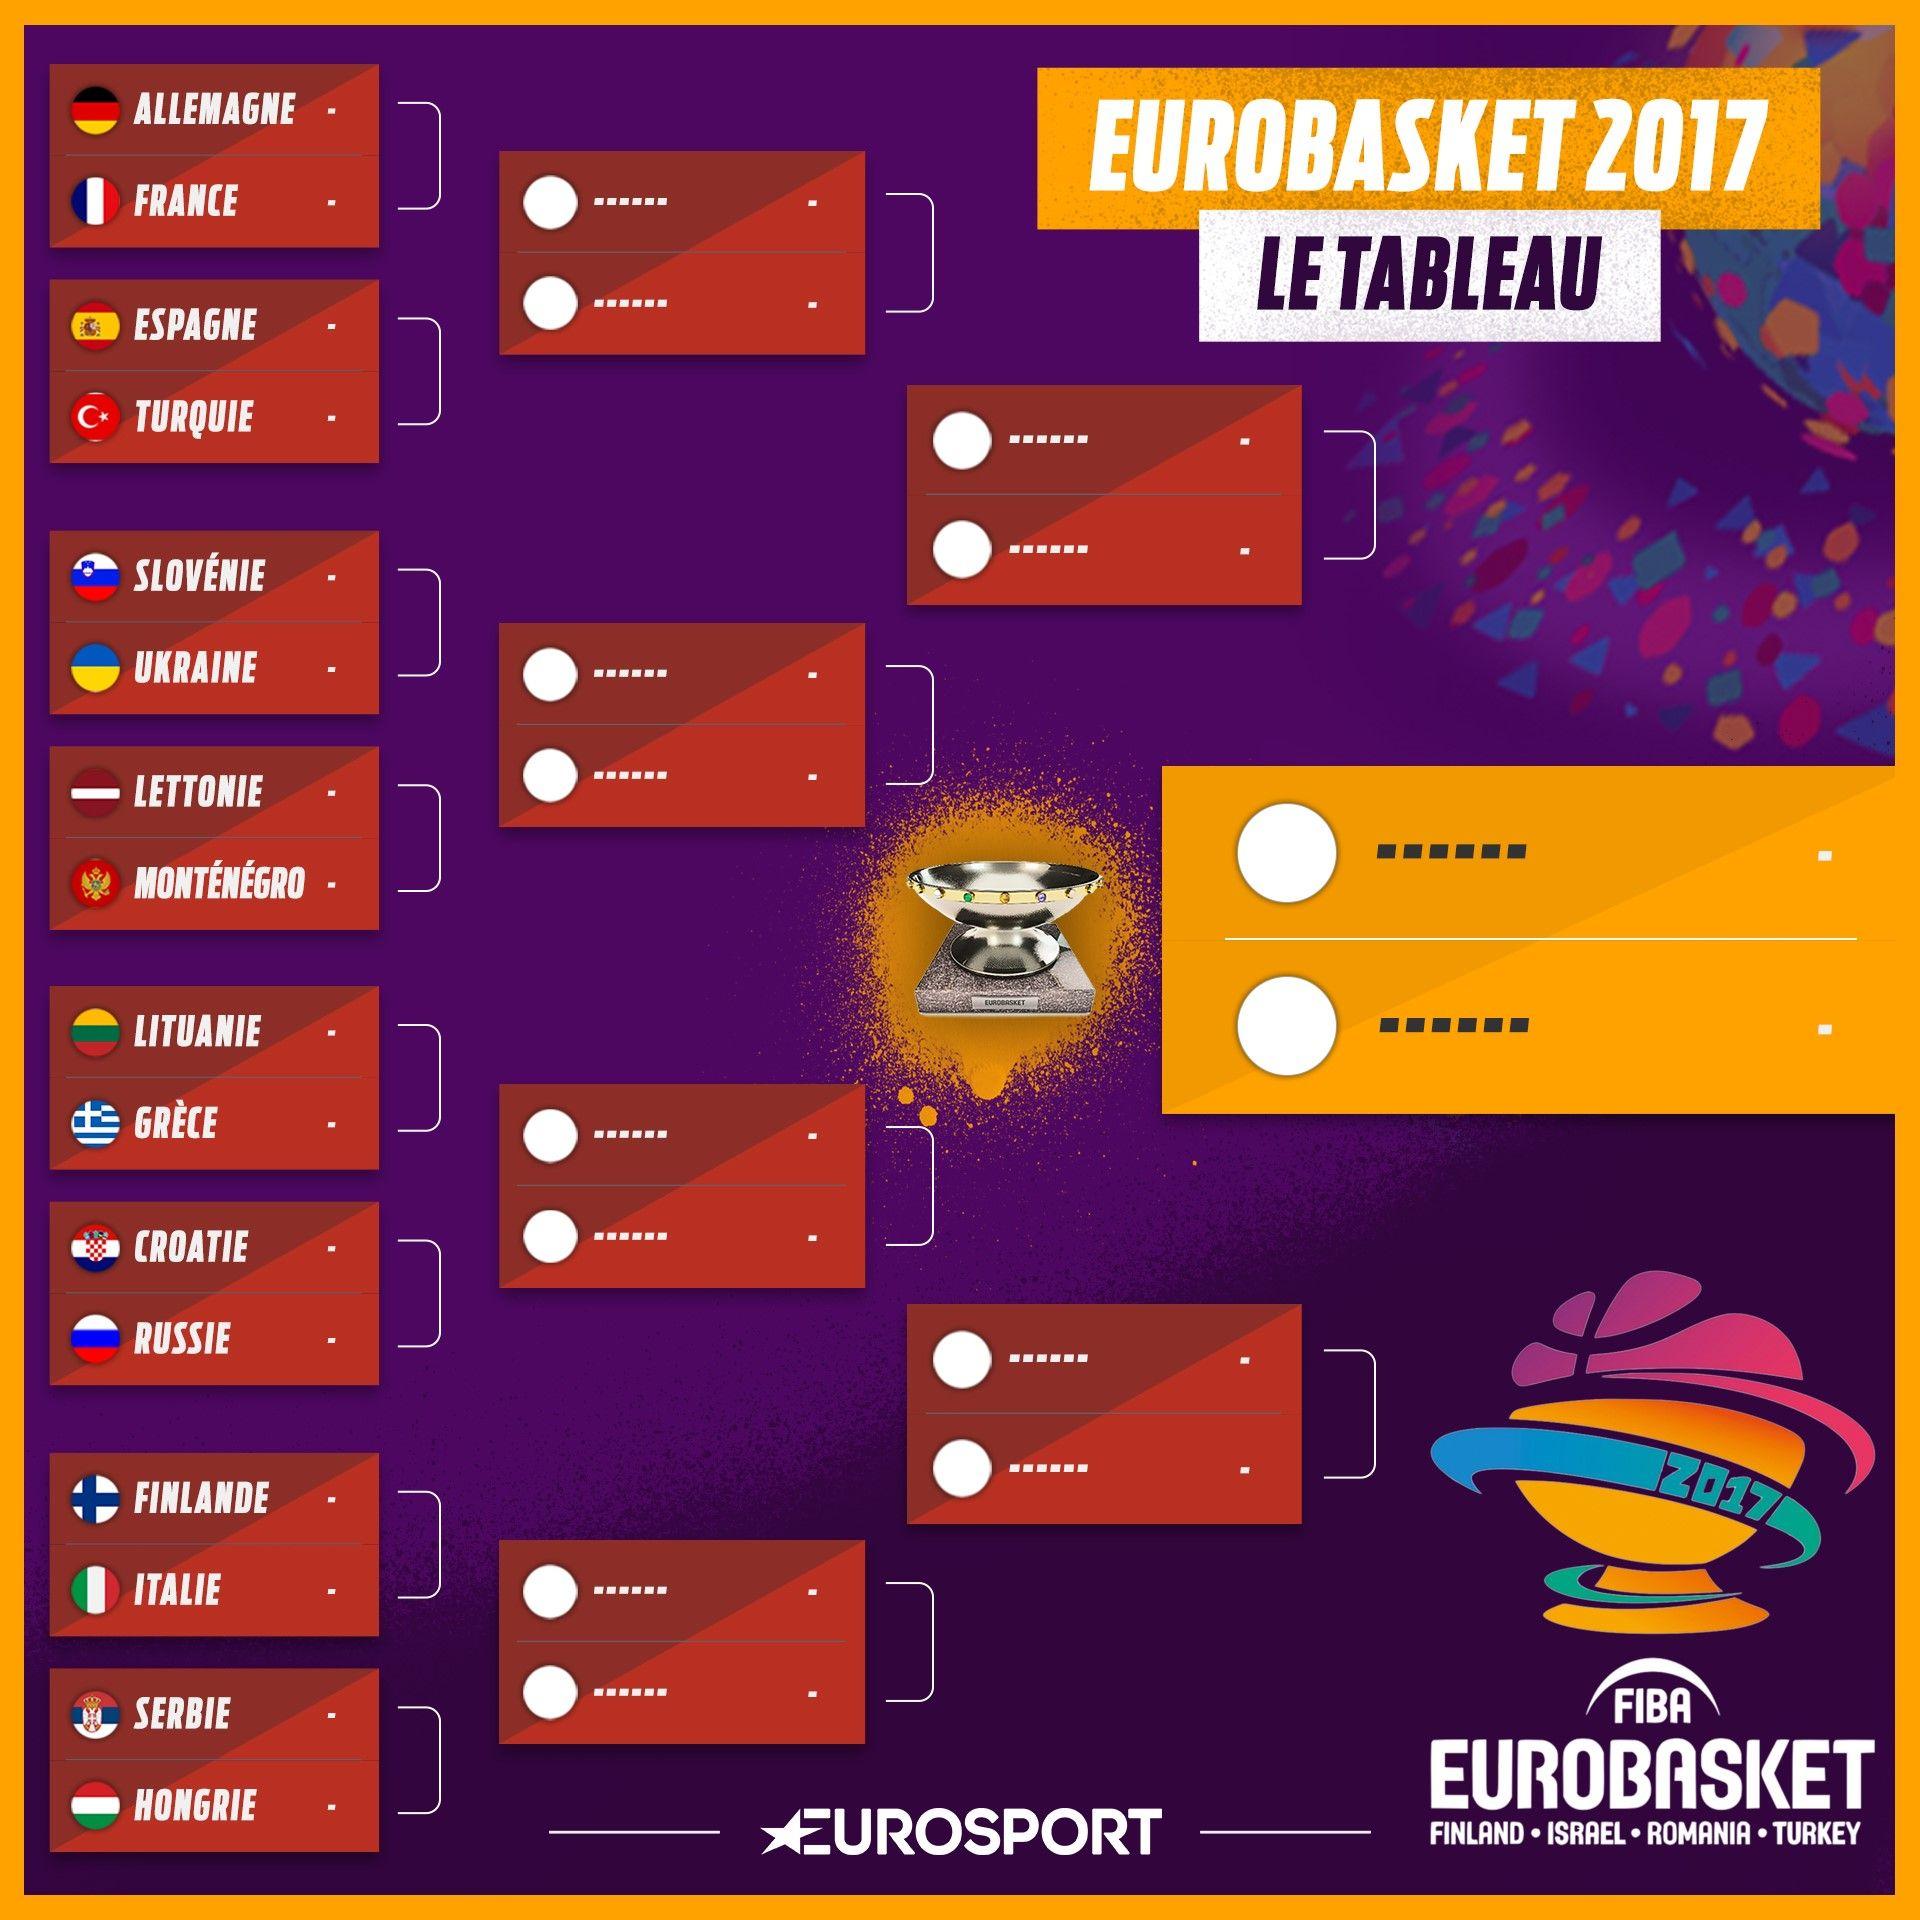 https://imgresizer.eurosport.com/unsafe/0x0/filters:format(jpeg):focal(1420x626:1422x624)/origin-imgresizer.eurosport.com/2017/09/08/2162799.jpg